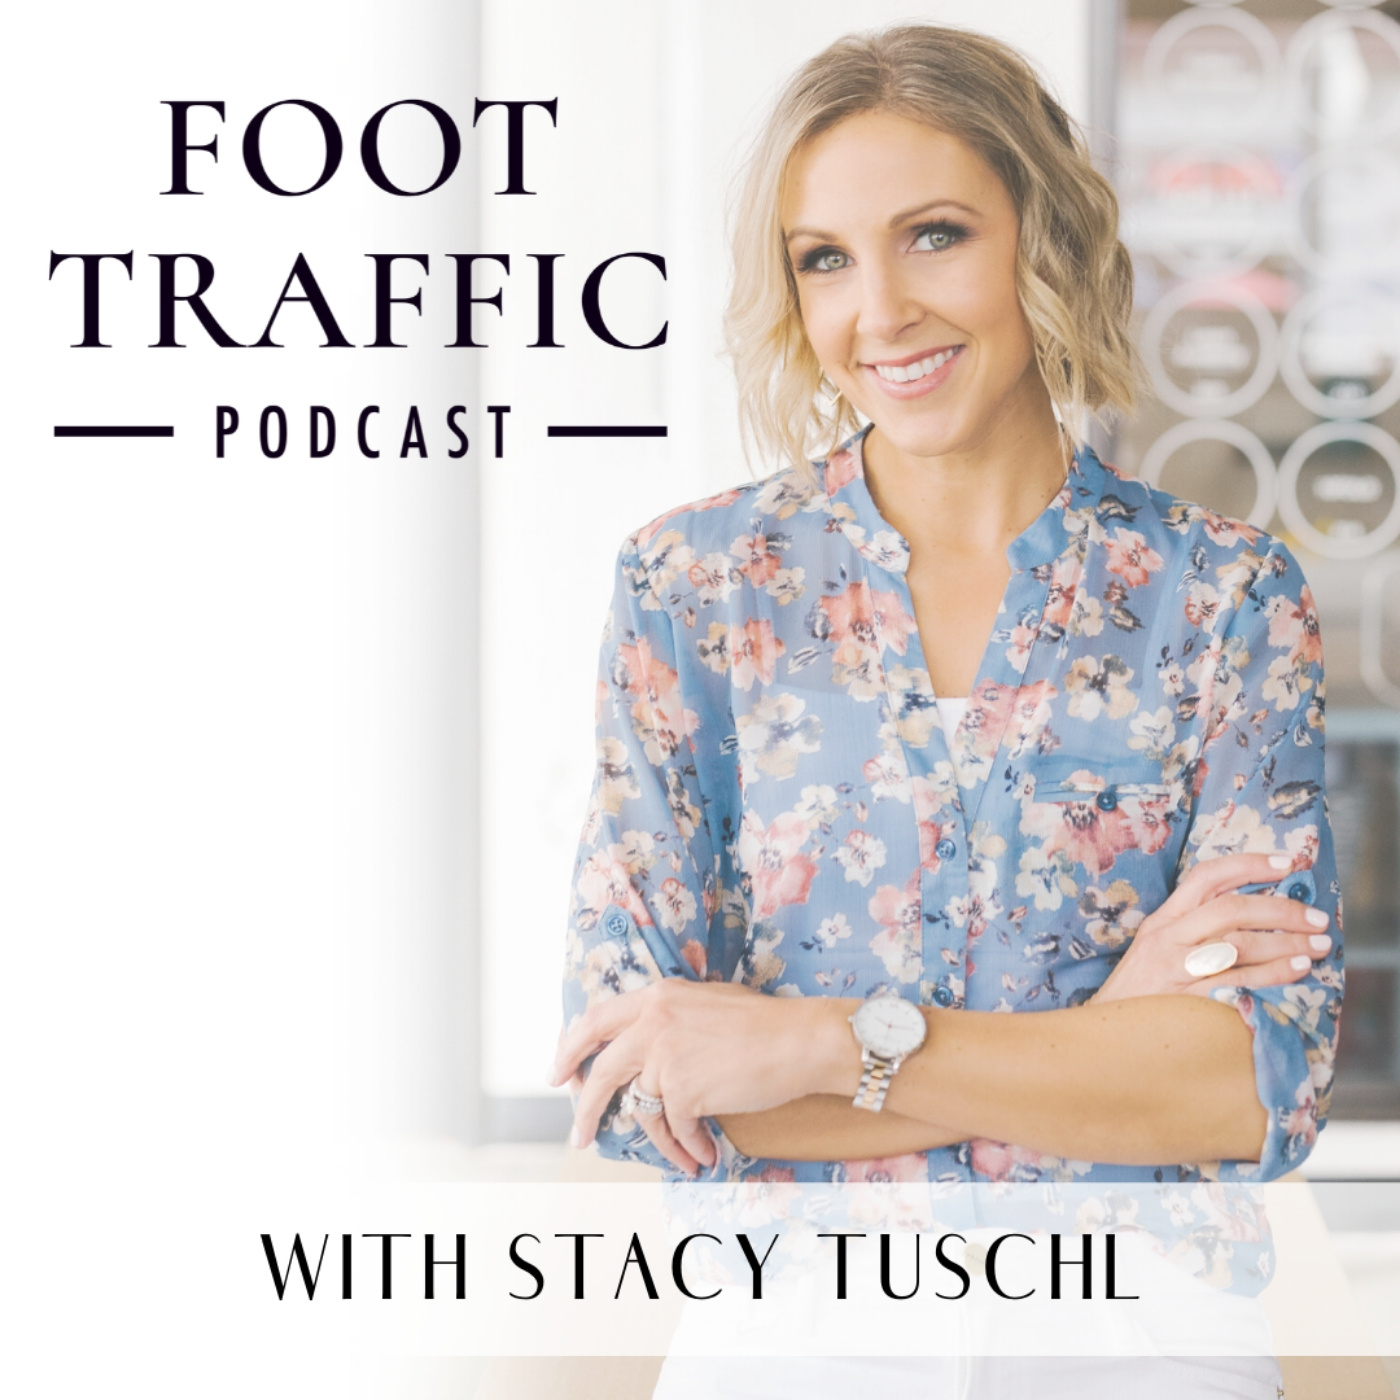 Foot Traffic Podcast